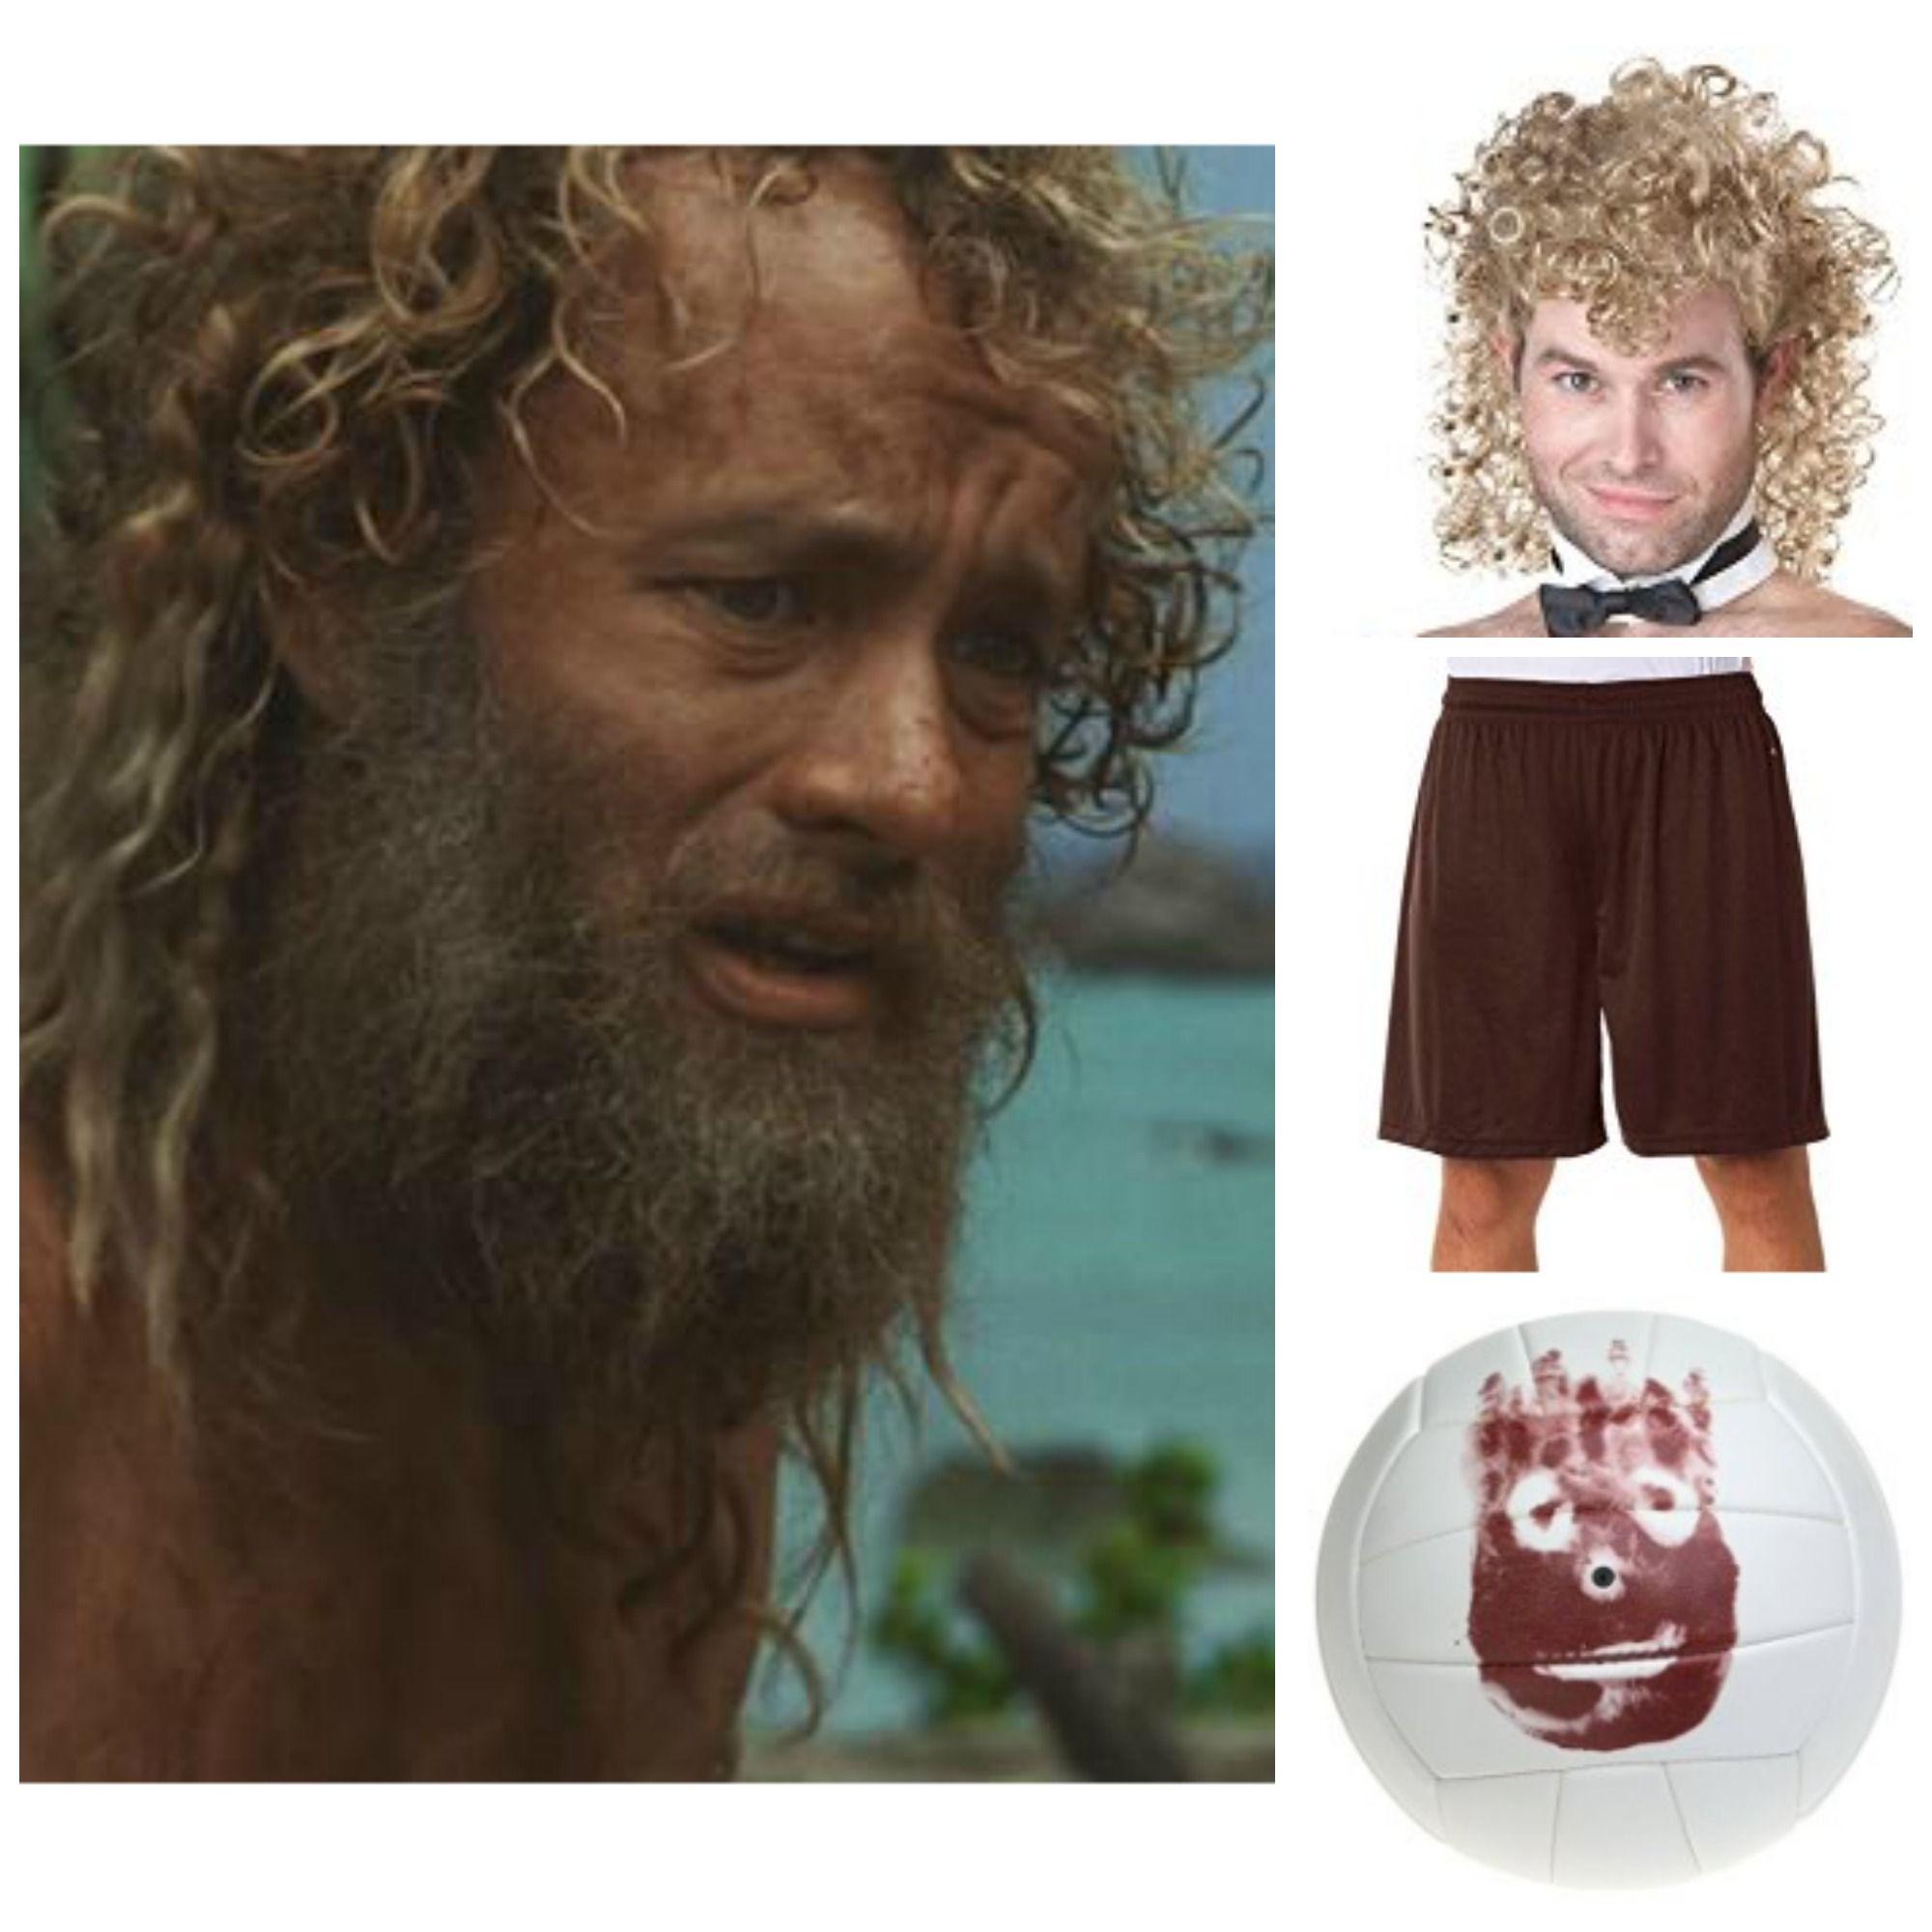 Castaway Halloween Costume for Guys with Beards | Bearded ...